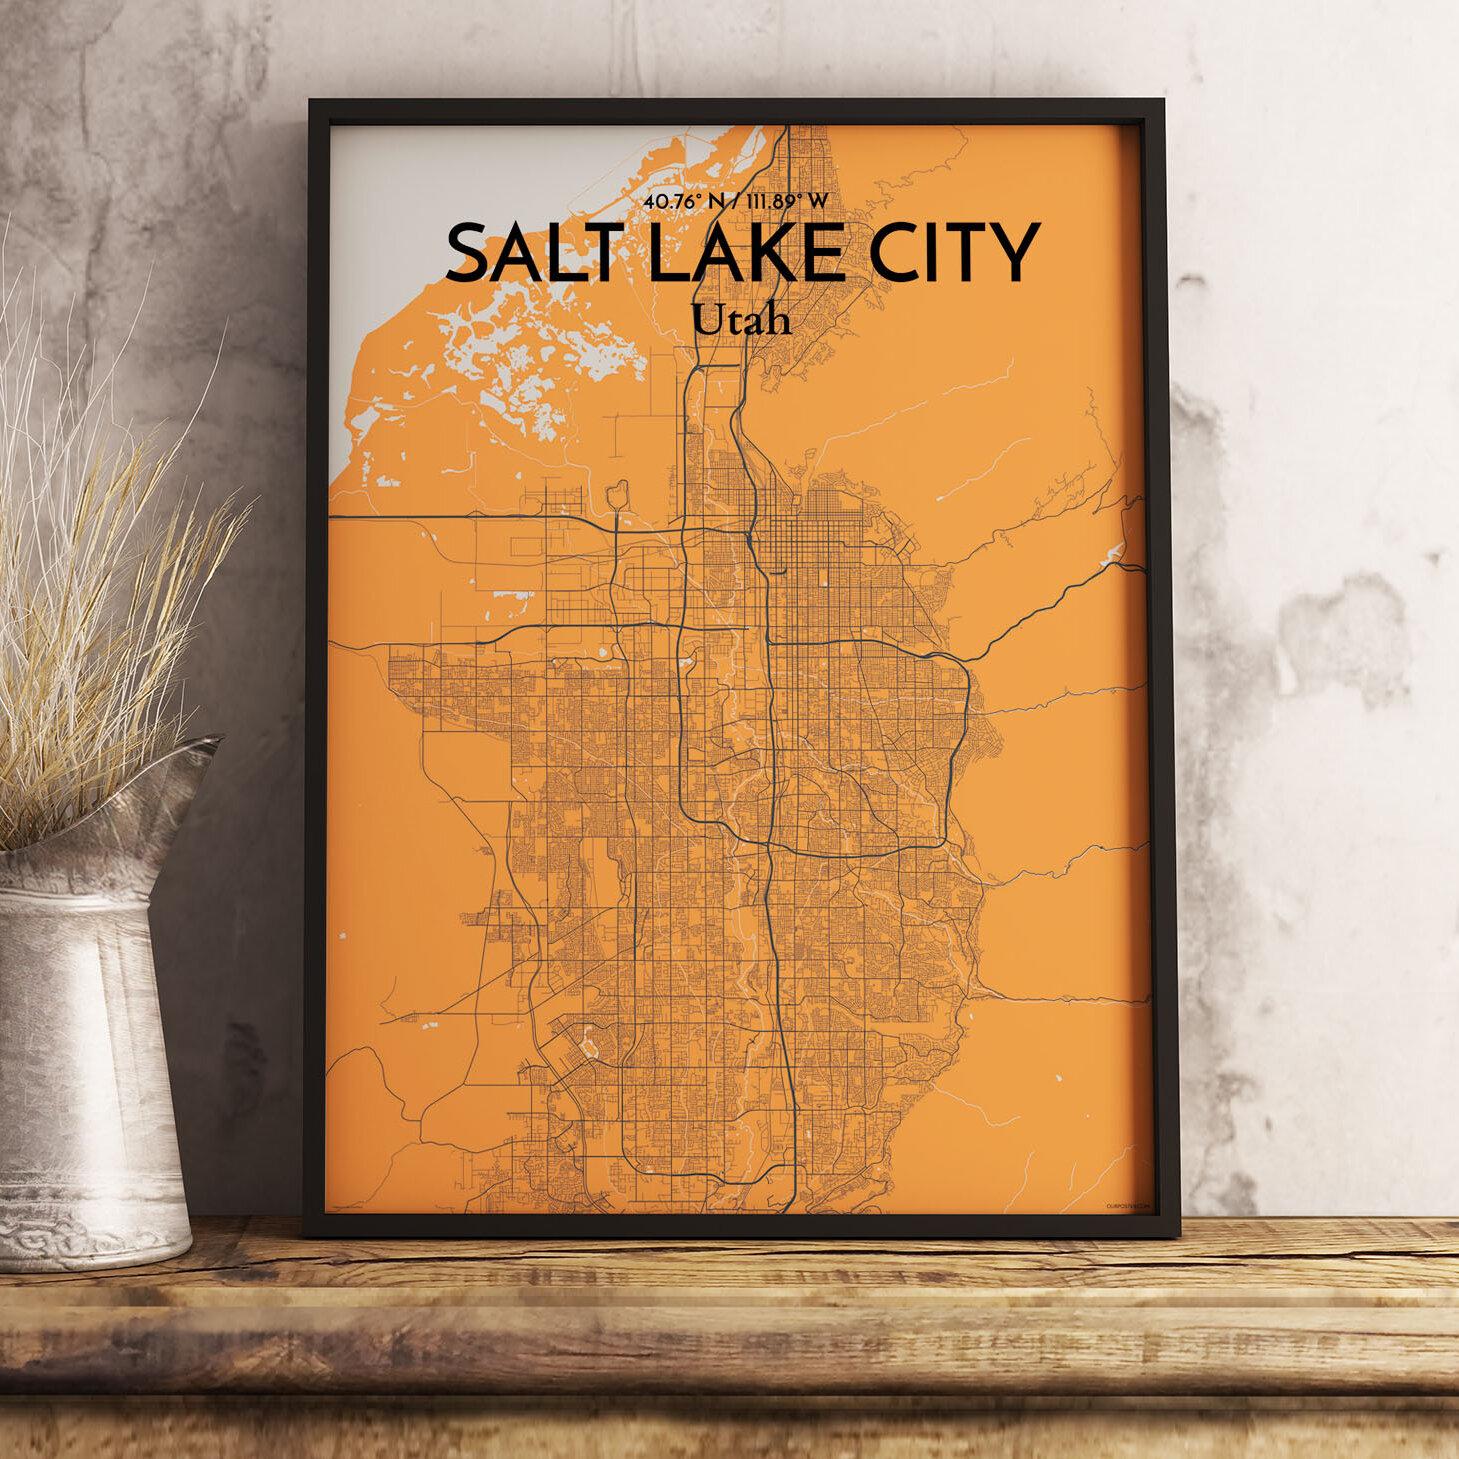 Digital Art Print Custom Map Canvas Print Salt Lake City Map Print Salt Lake City Abstract Map Art Salt Lake City Art Poster Print